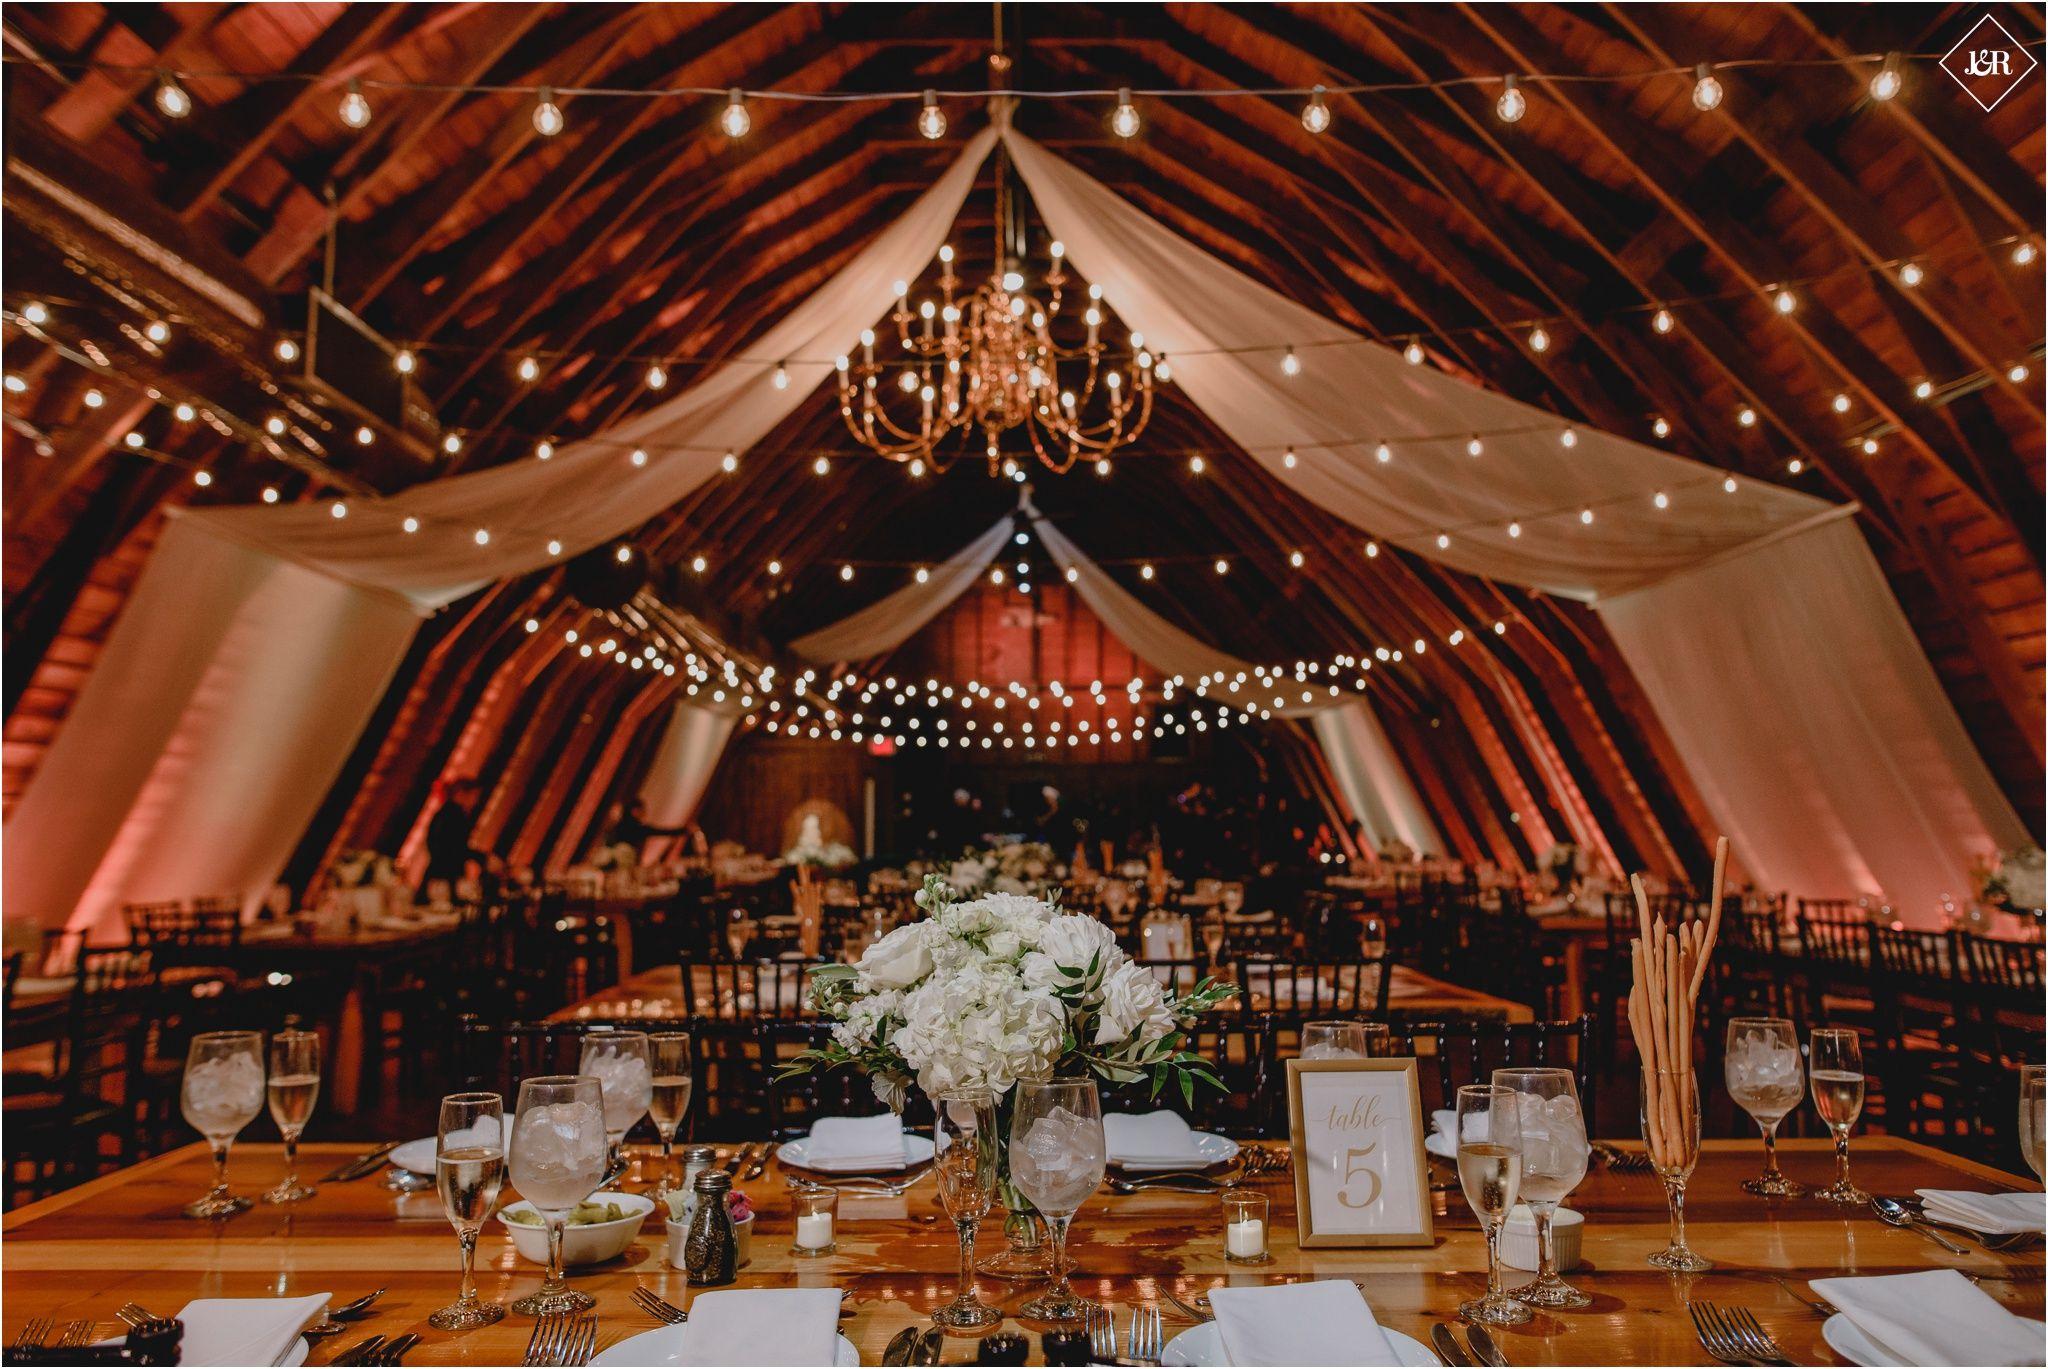 Momentous Wedding At Perona Farms J R Photography Kristen Nick Perona Farms Nj Wedding Photographer Nj Weddings